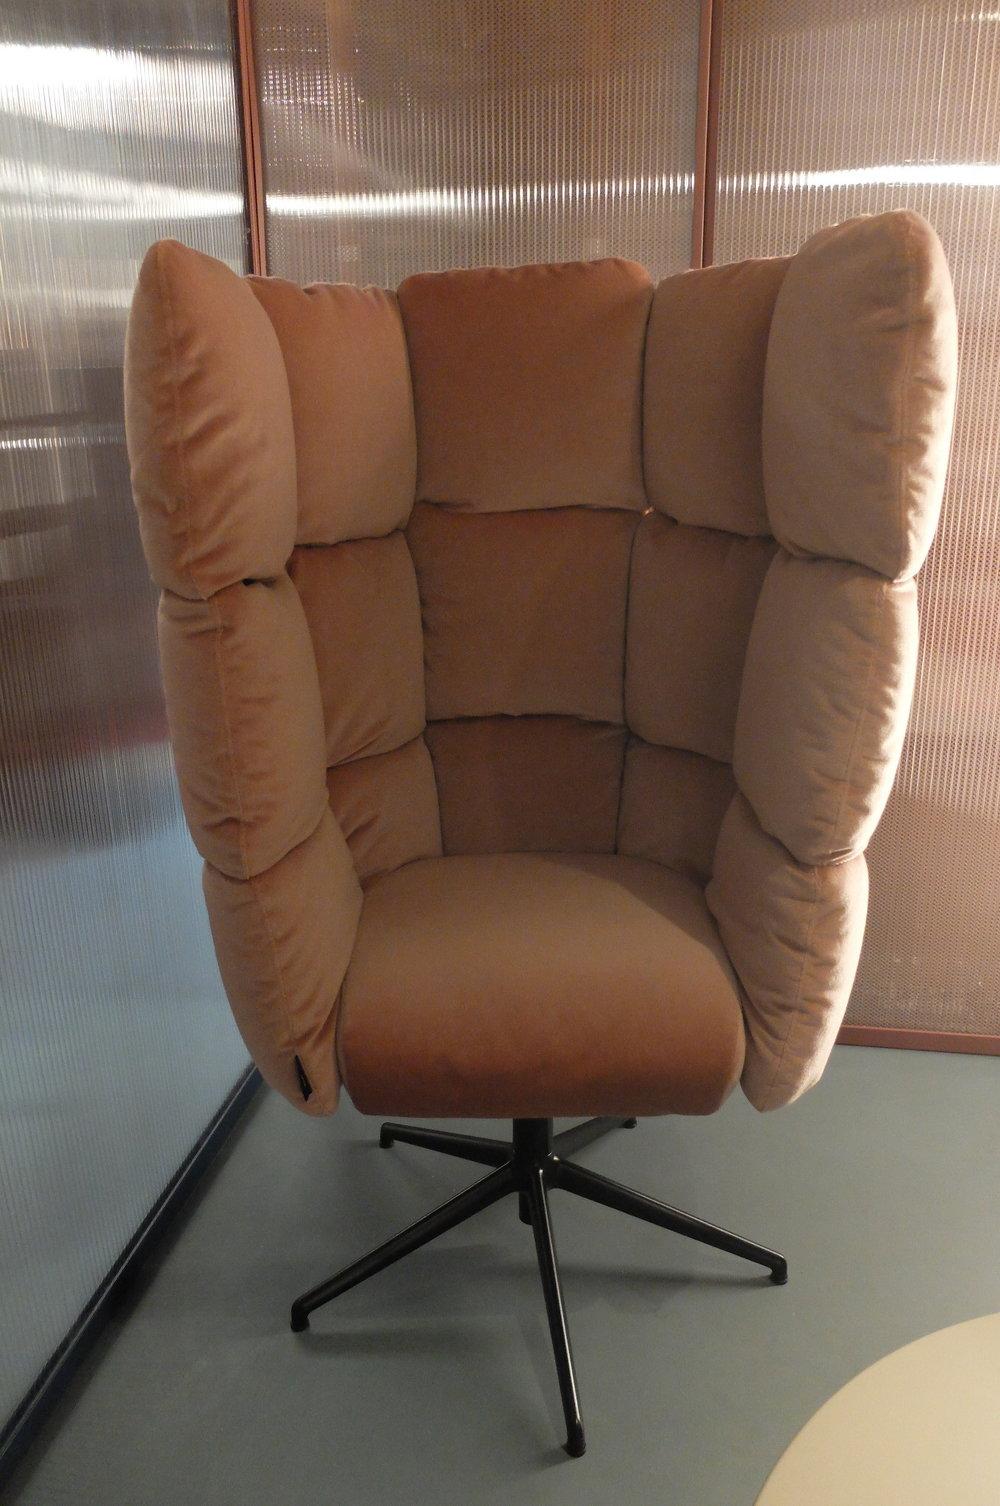 Undecided chair par Raffaella Mangiarotti. Wonder Office exhibition. MANERBA